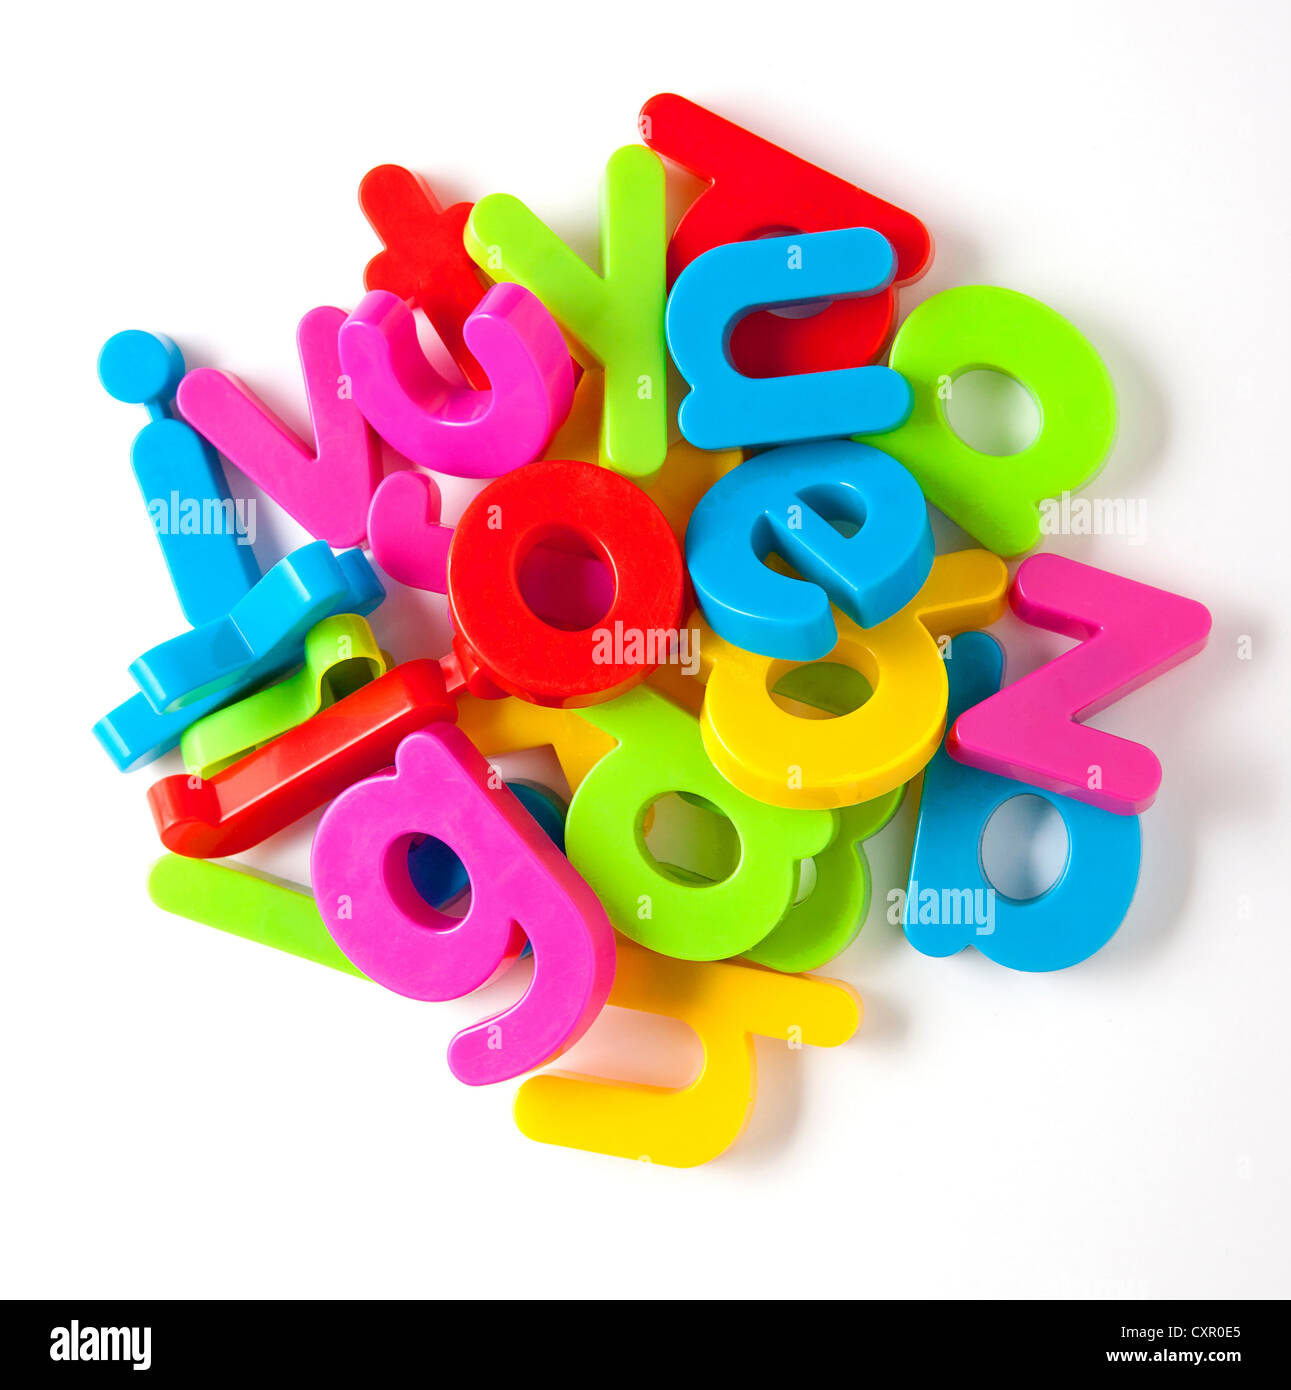 Alphabet fridge magnets in a pile - Stock Image